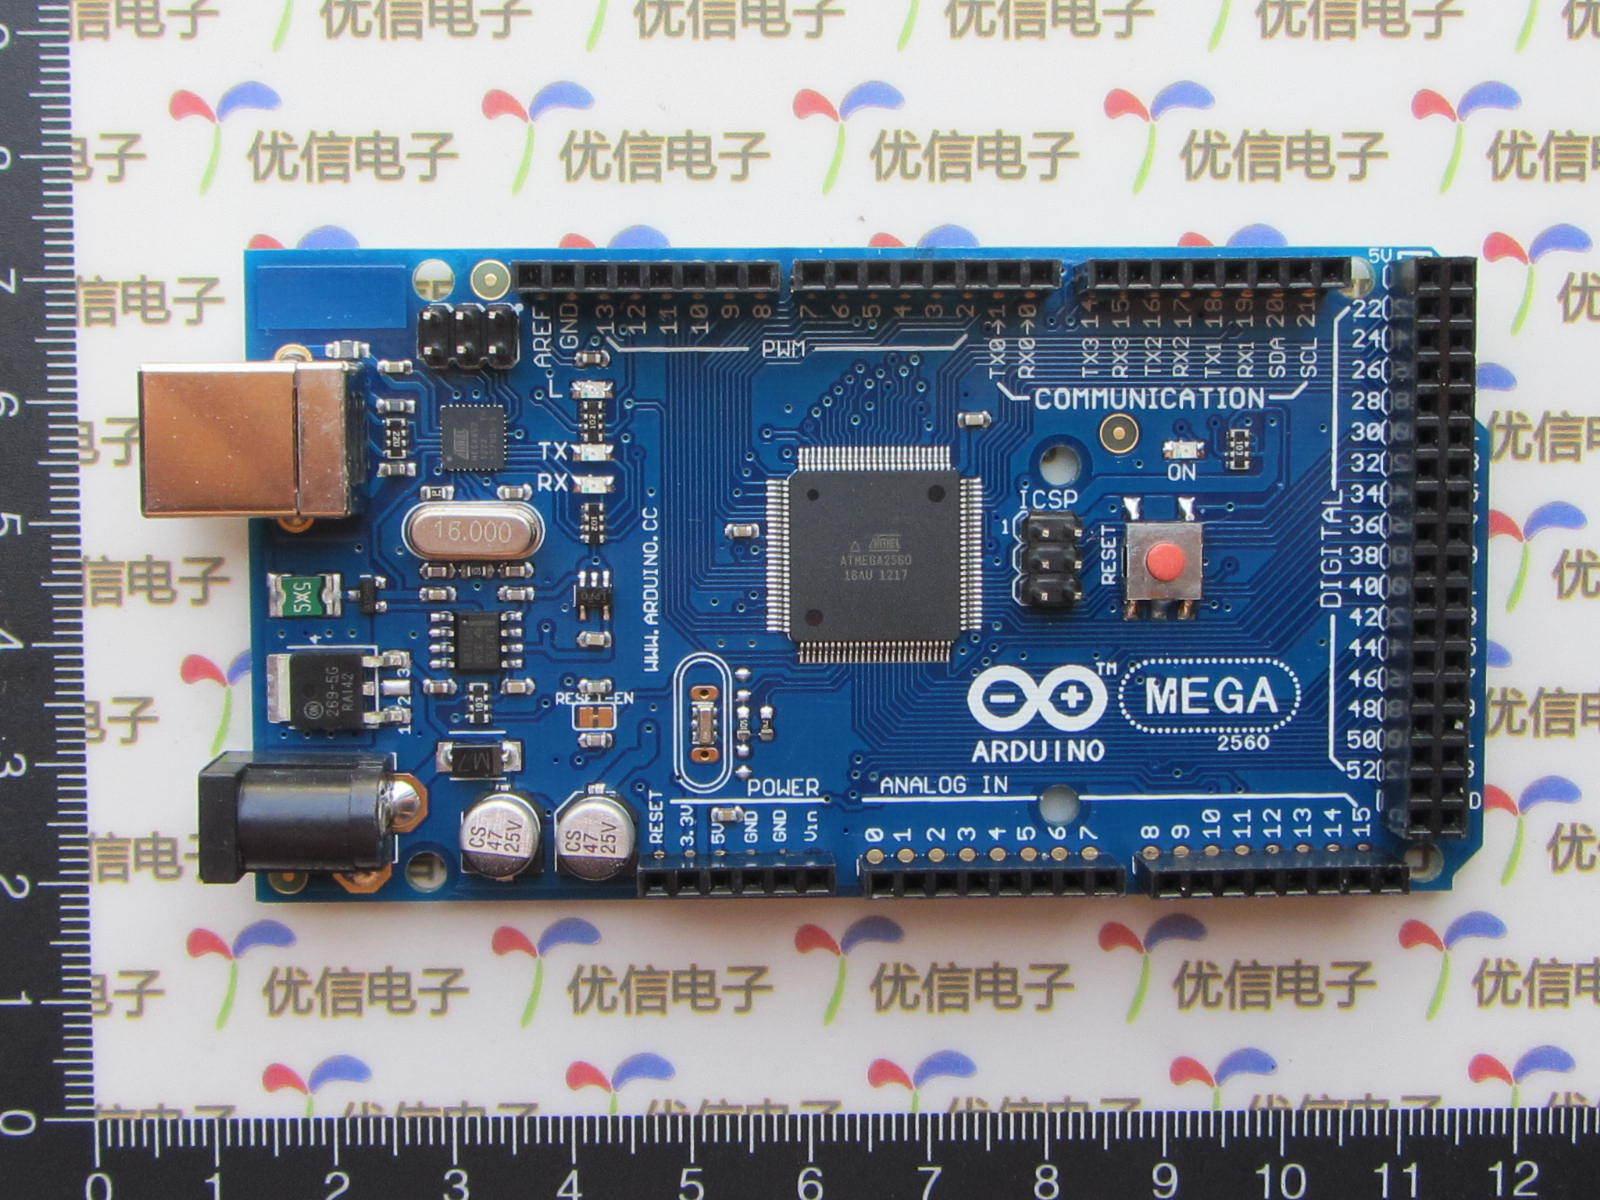 Elegoo Industries,Ingenious fun DIY electronics and kits